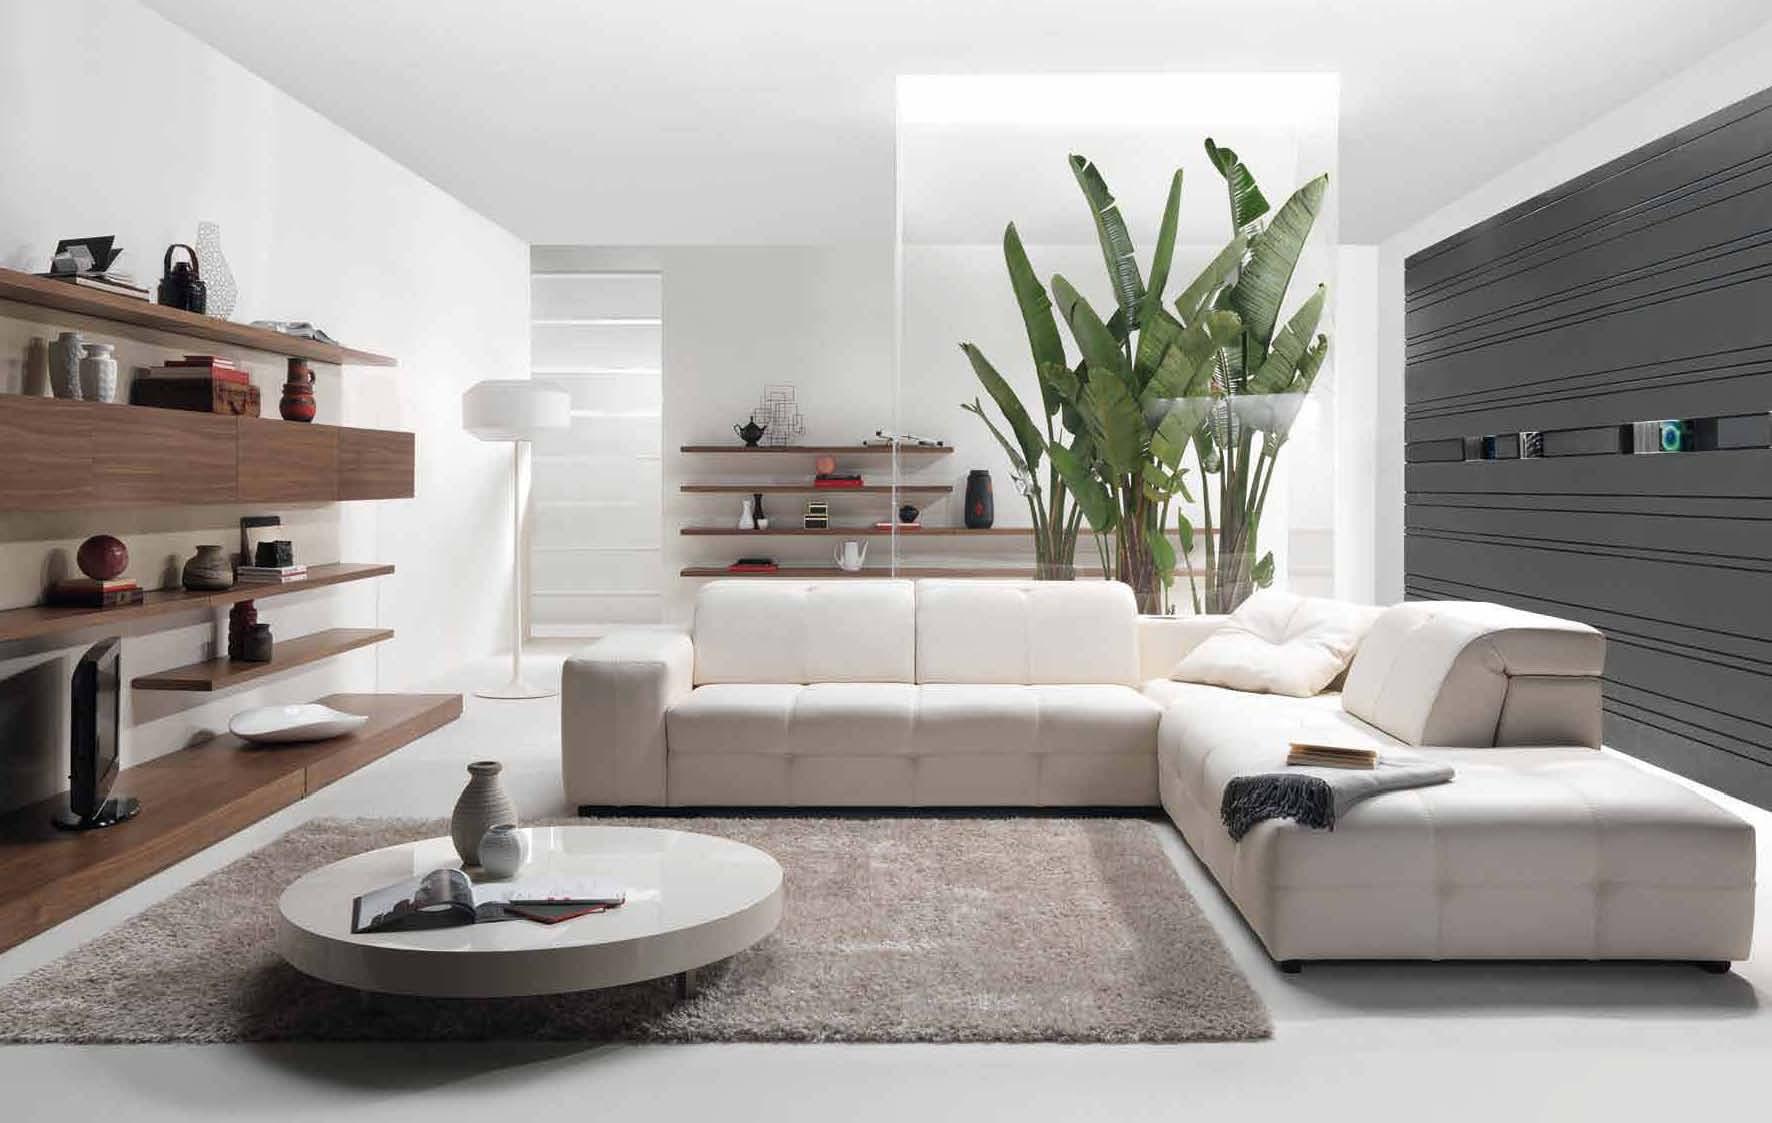 Amazing of Extraordinary O By Top Interior Designers #6538